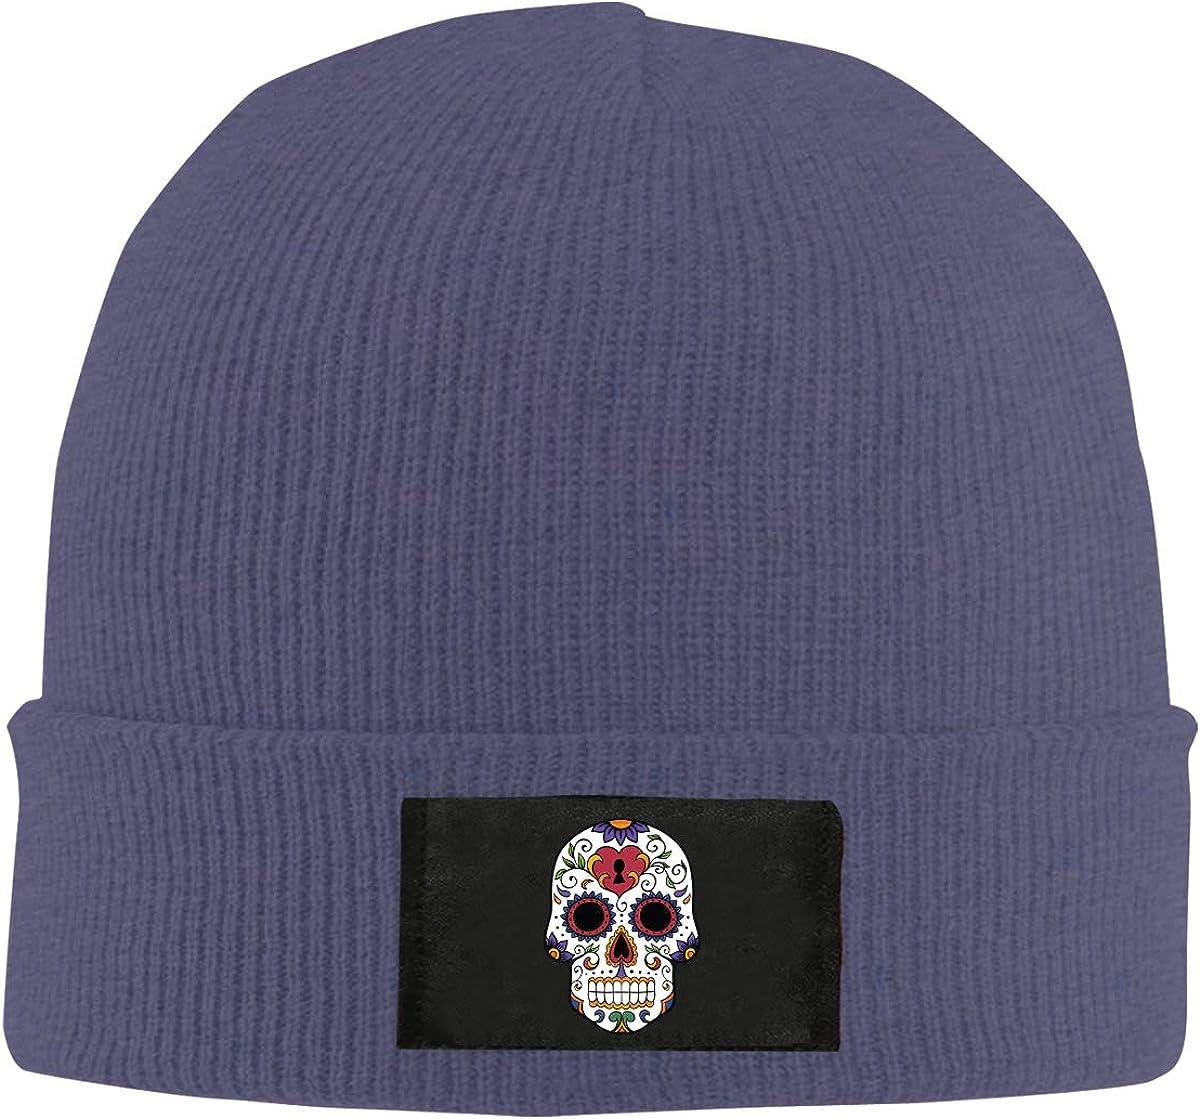 Unisex White Sugar Skull Knitted Hat 100/% Acrylic Cotton Skull Cap